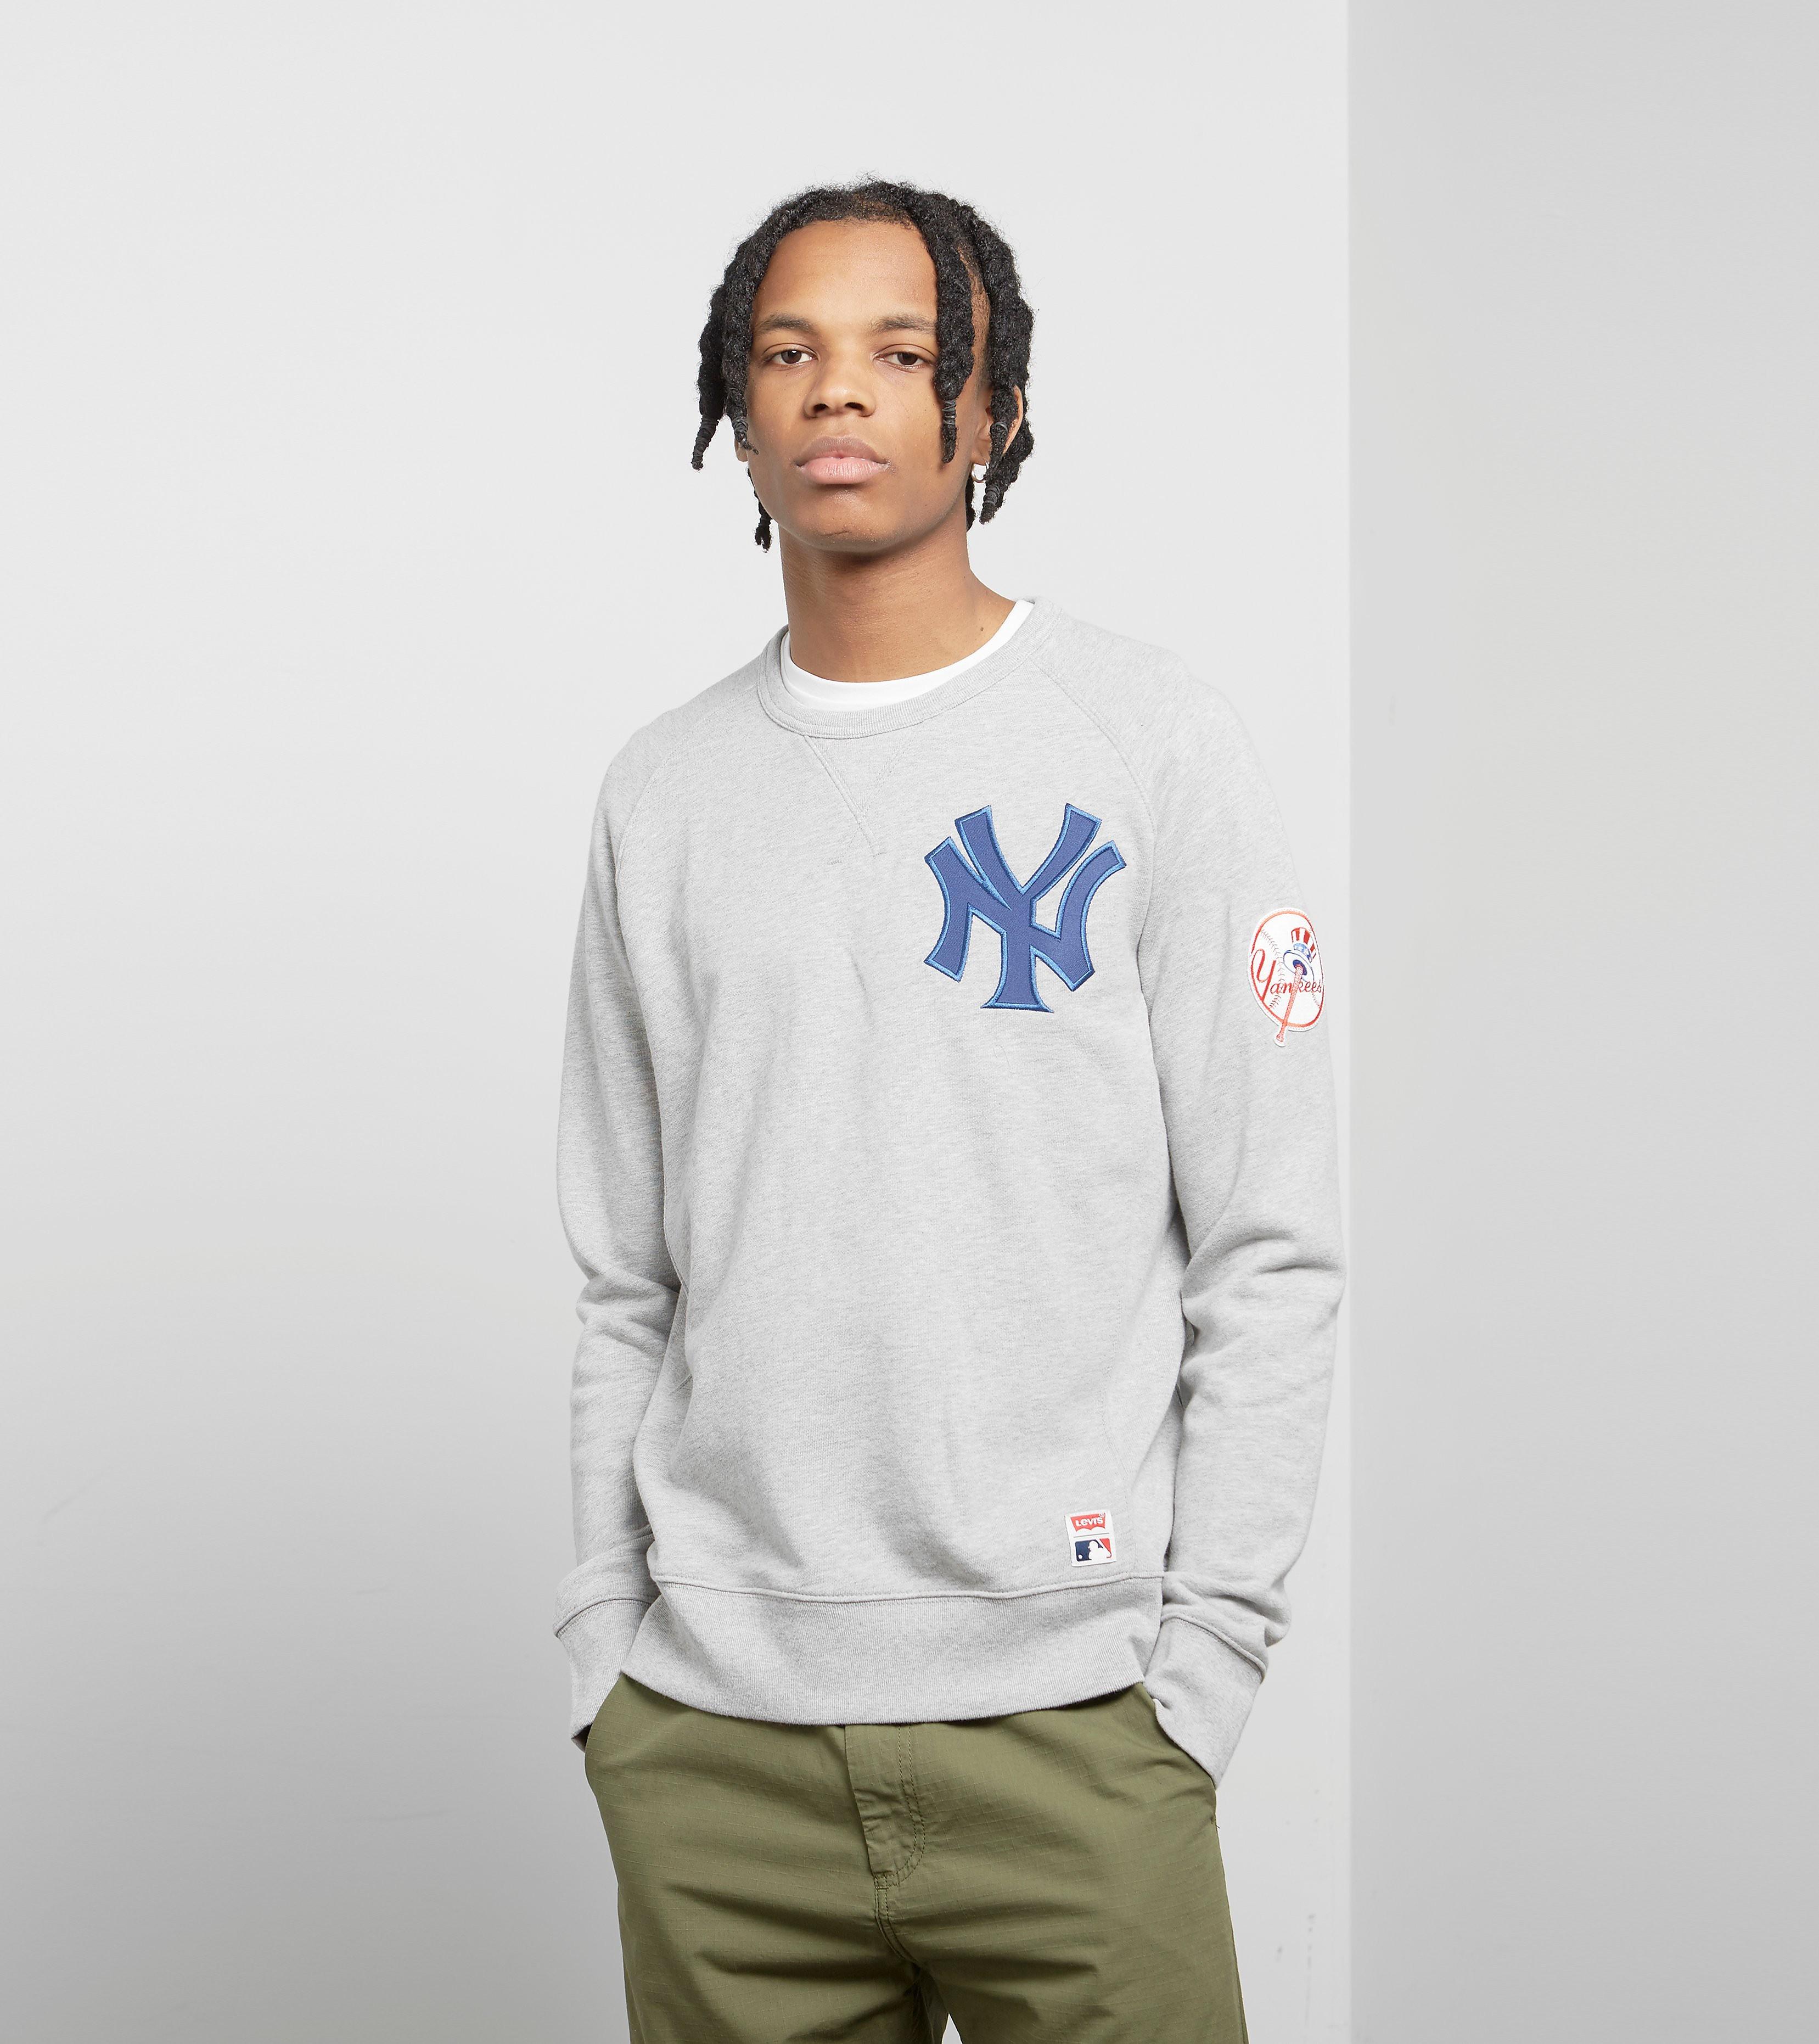 Levis x MLB New York Yankees Sweatshirt